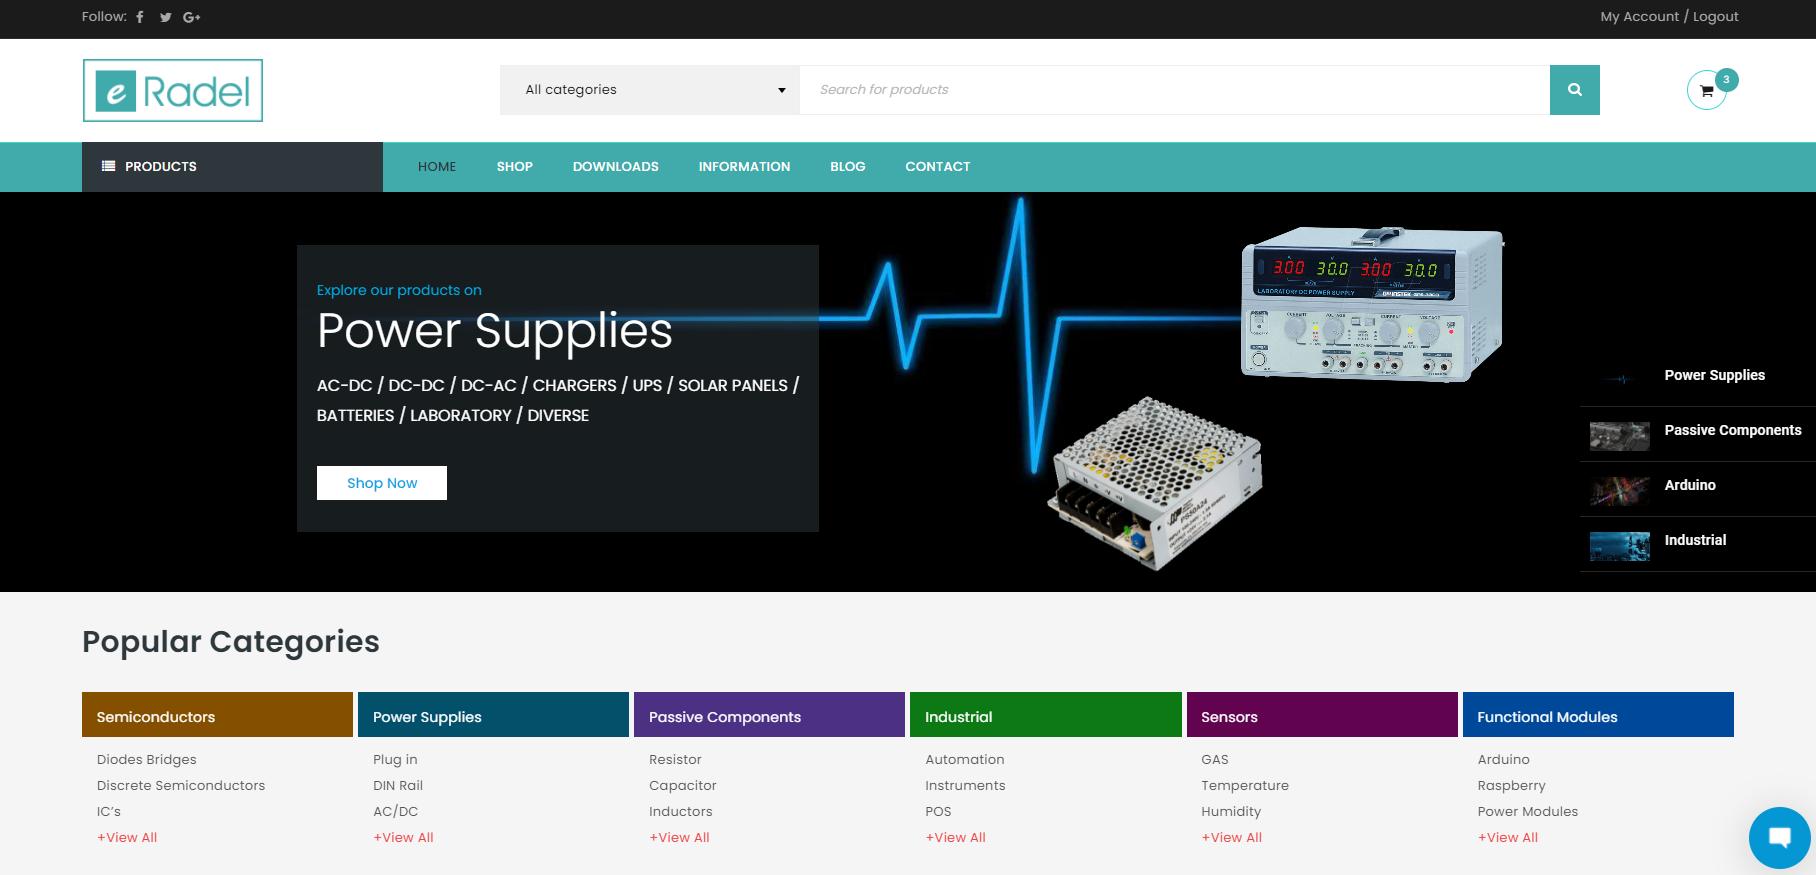 Screenshot 1 - Κατασκευή eshop eradel.com - 3site